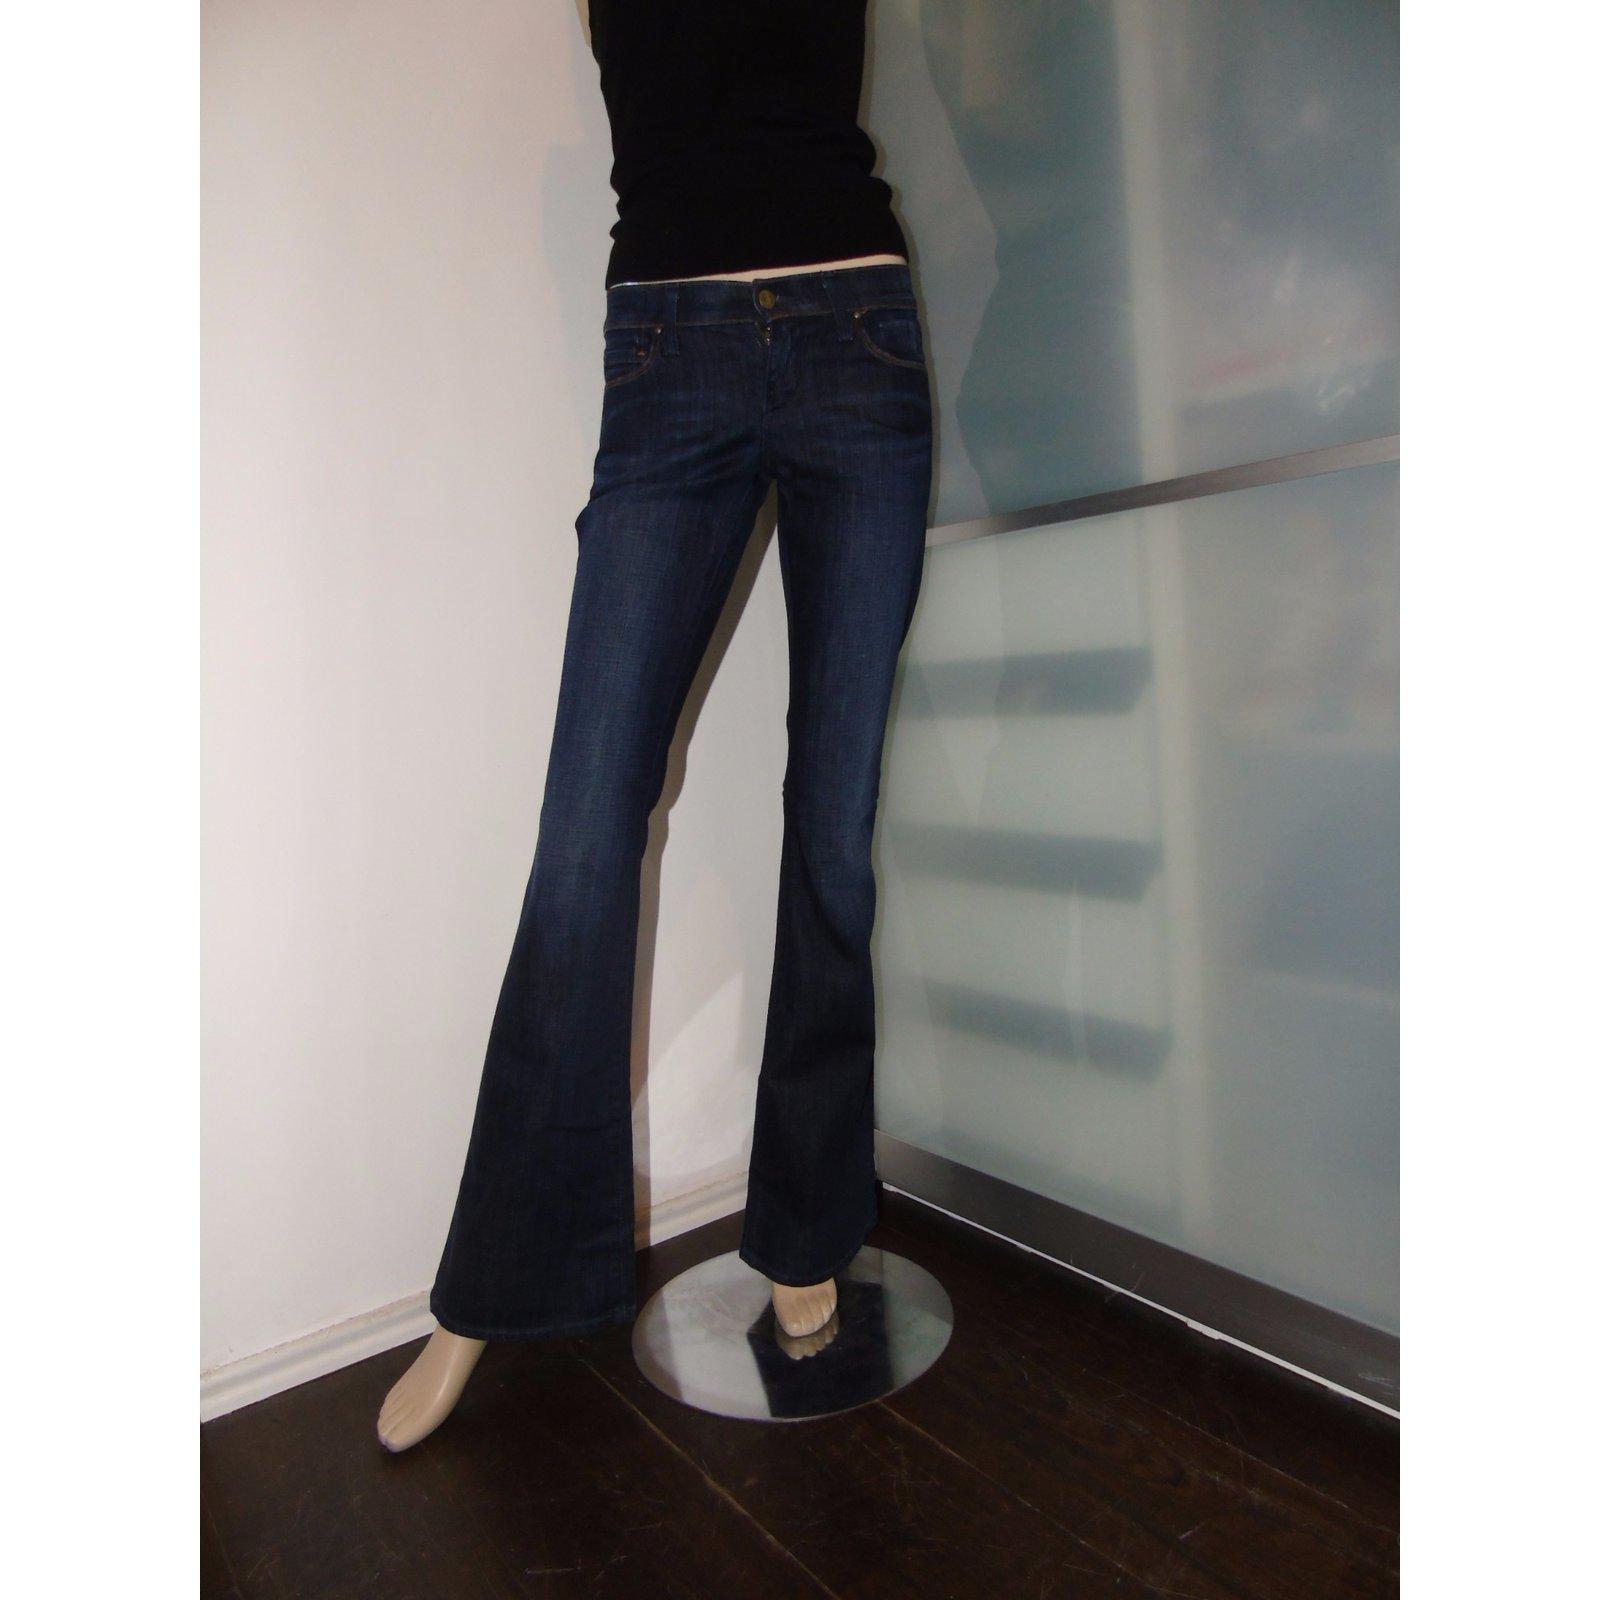 jeans citizens of humanity ingrid coton elasthane bleu joli closet. Black Bedroom Furniture Sets. Home Design Ideas